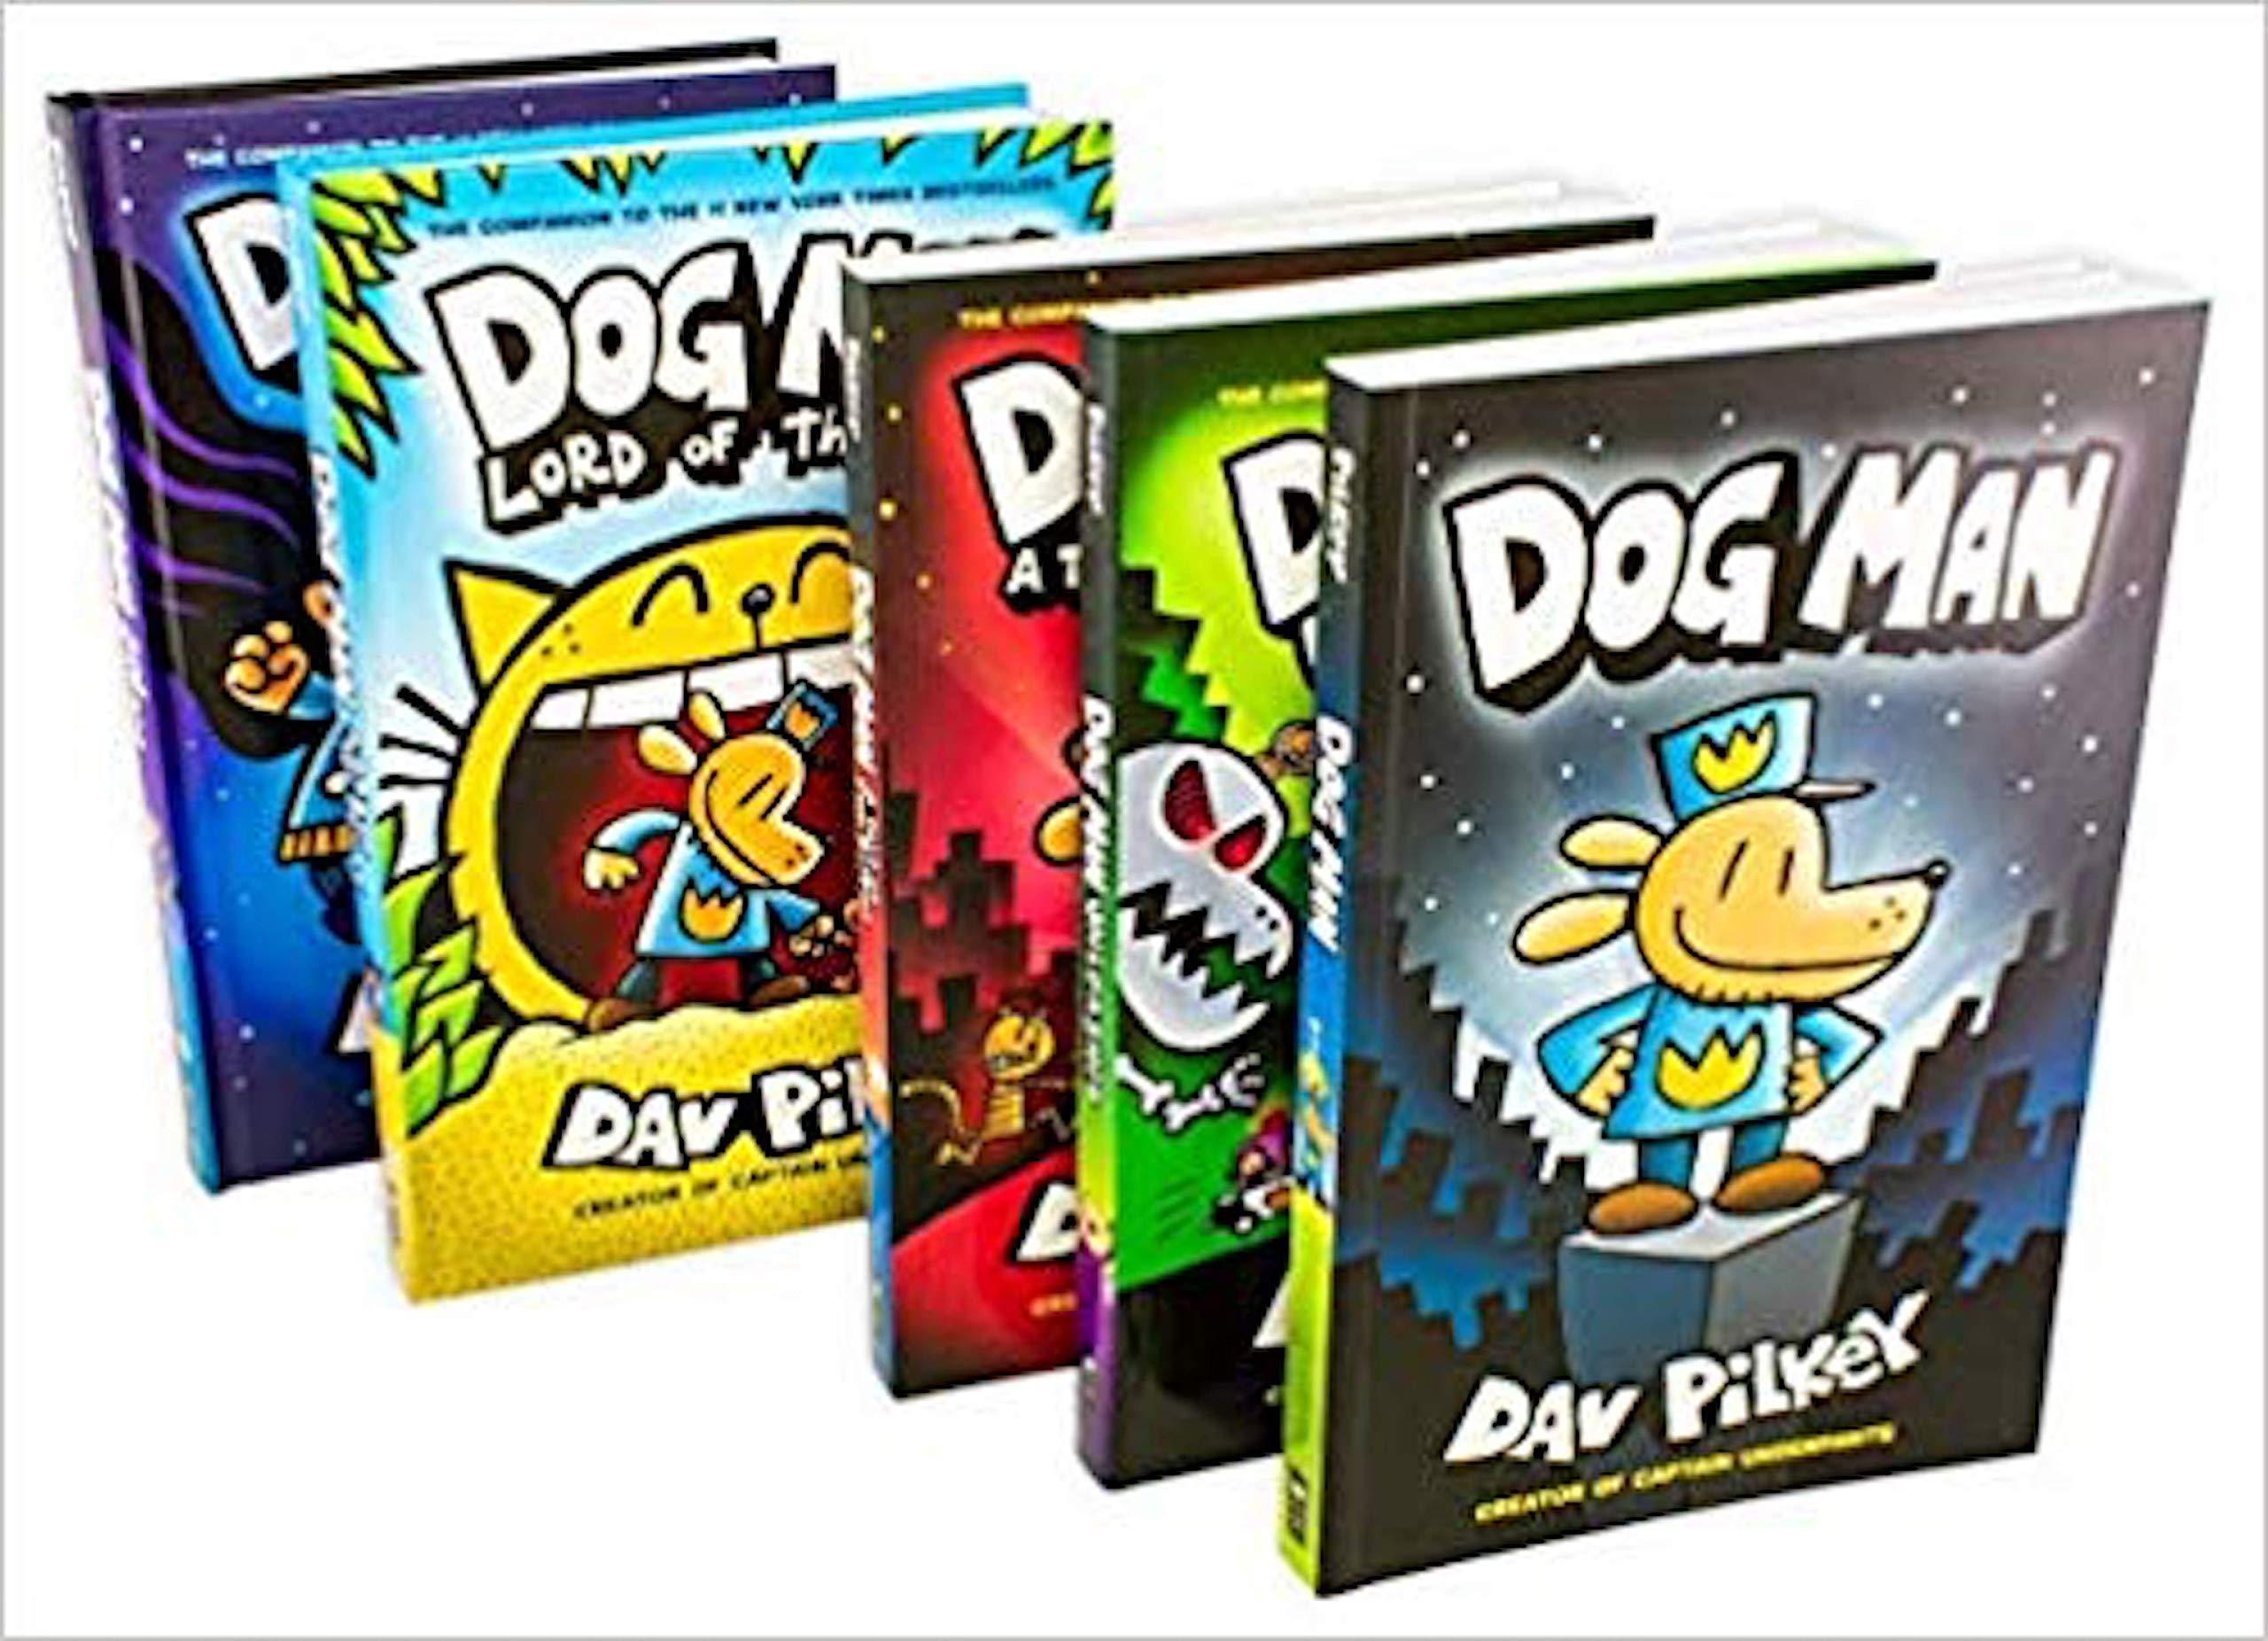 Dog Man Collection Set, 5 Books